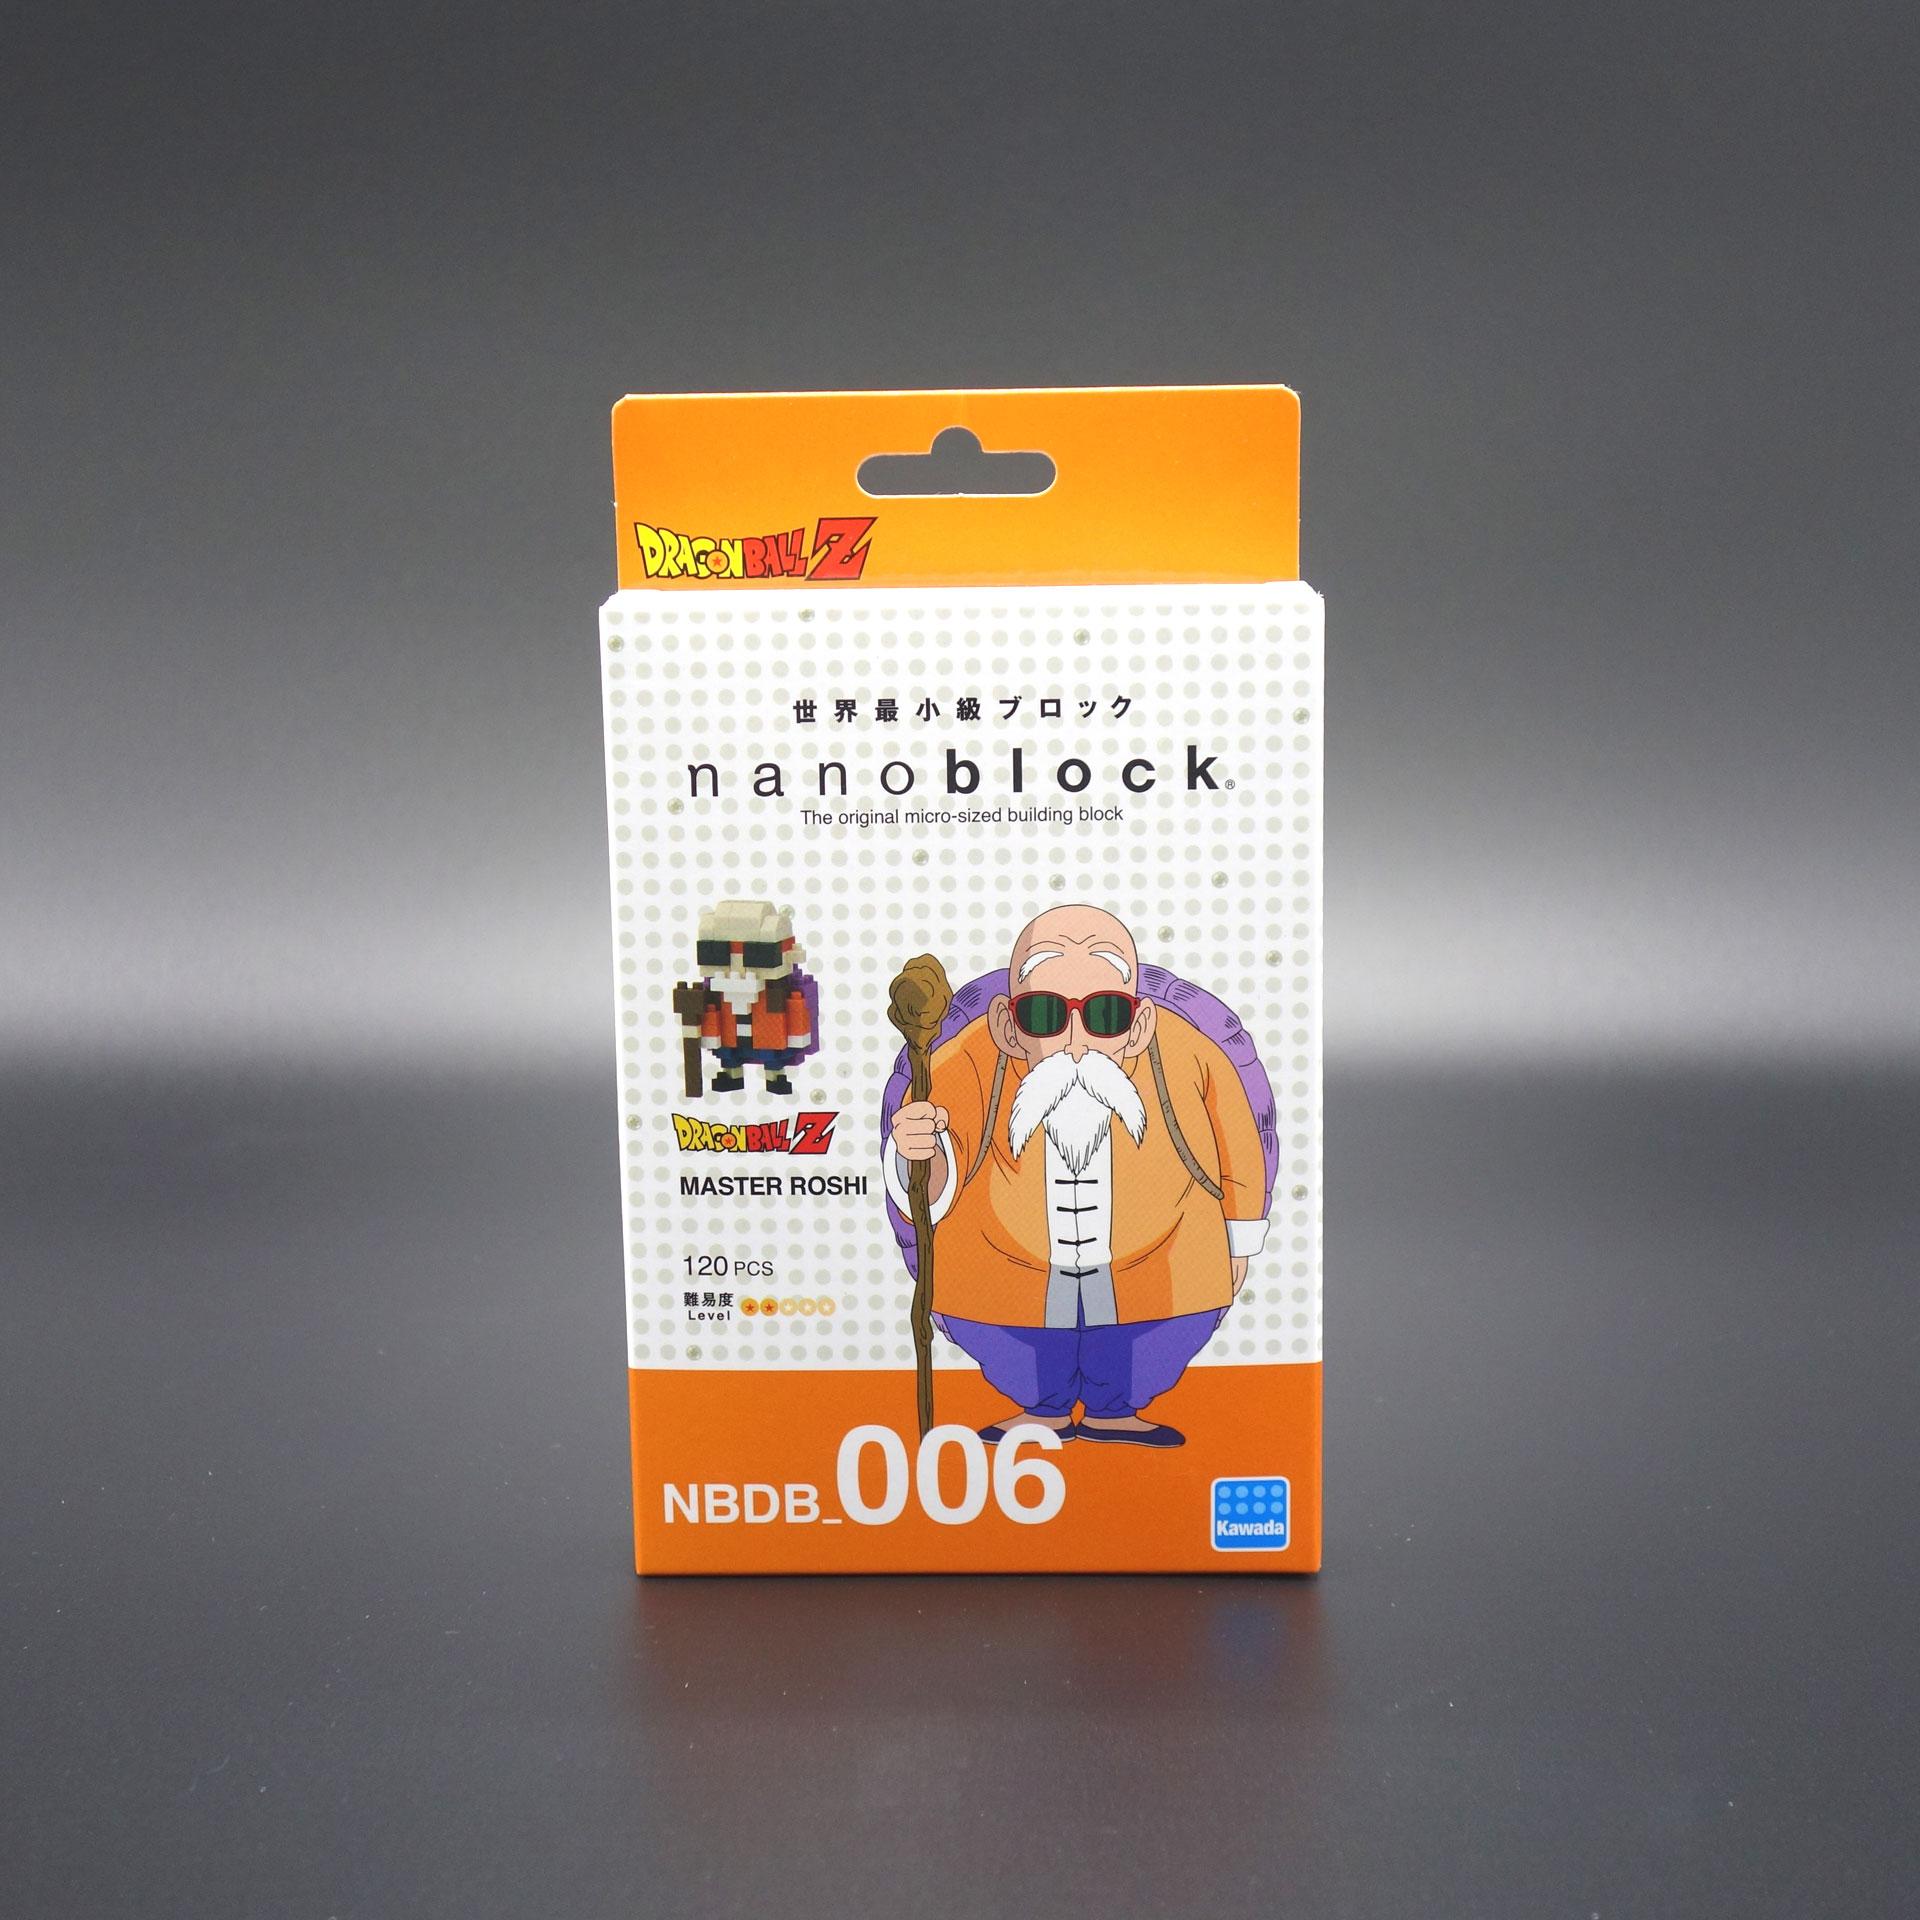 nanoblock Dragonball Z Master Roshi